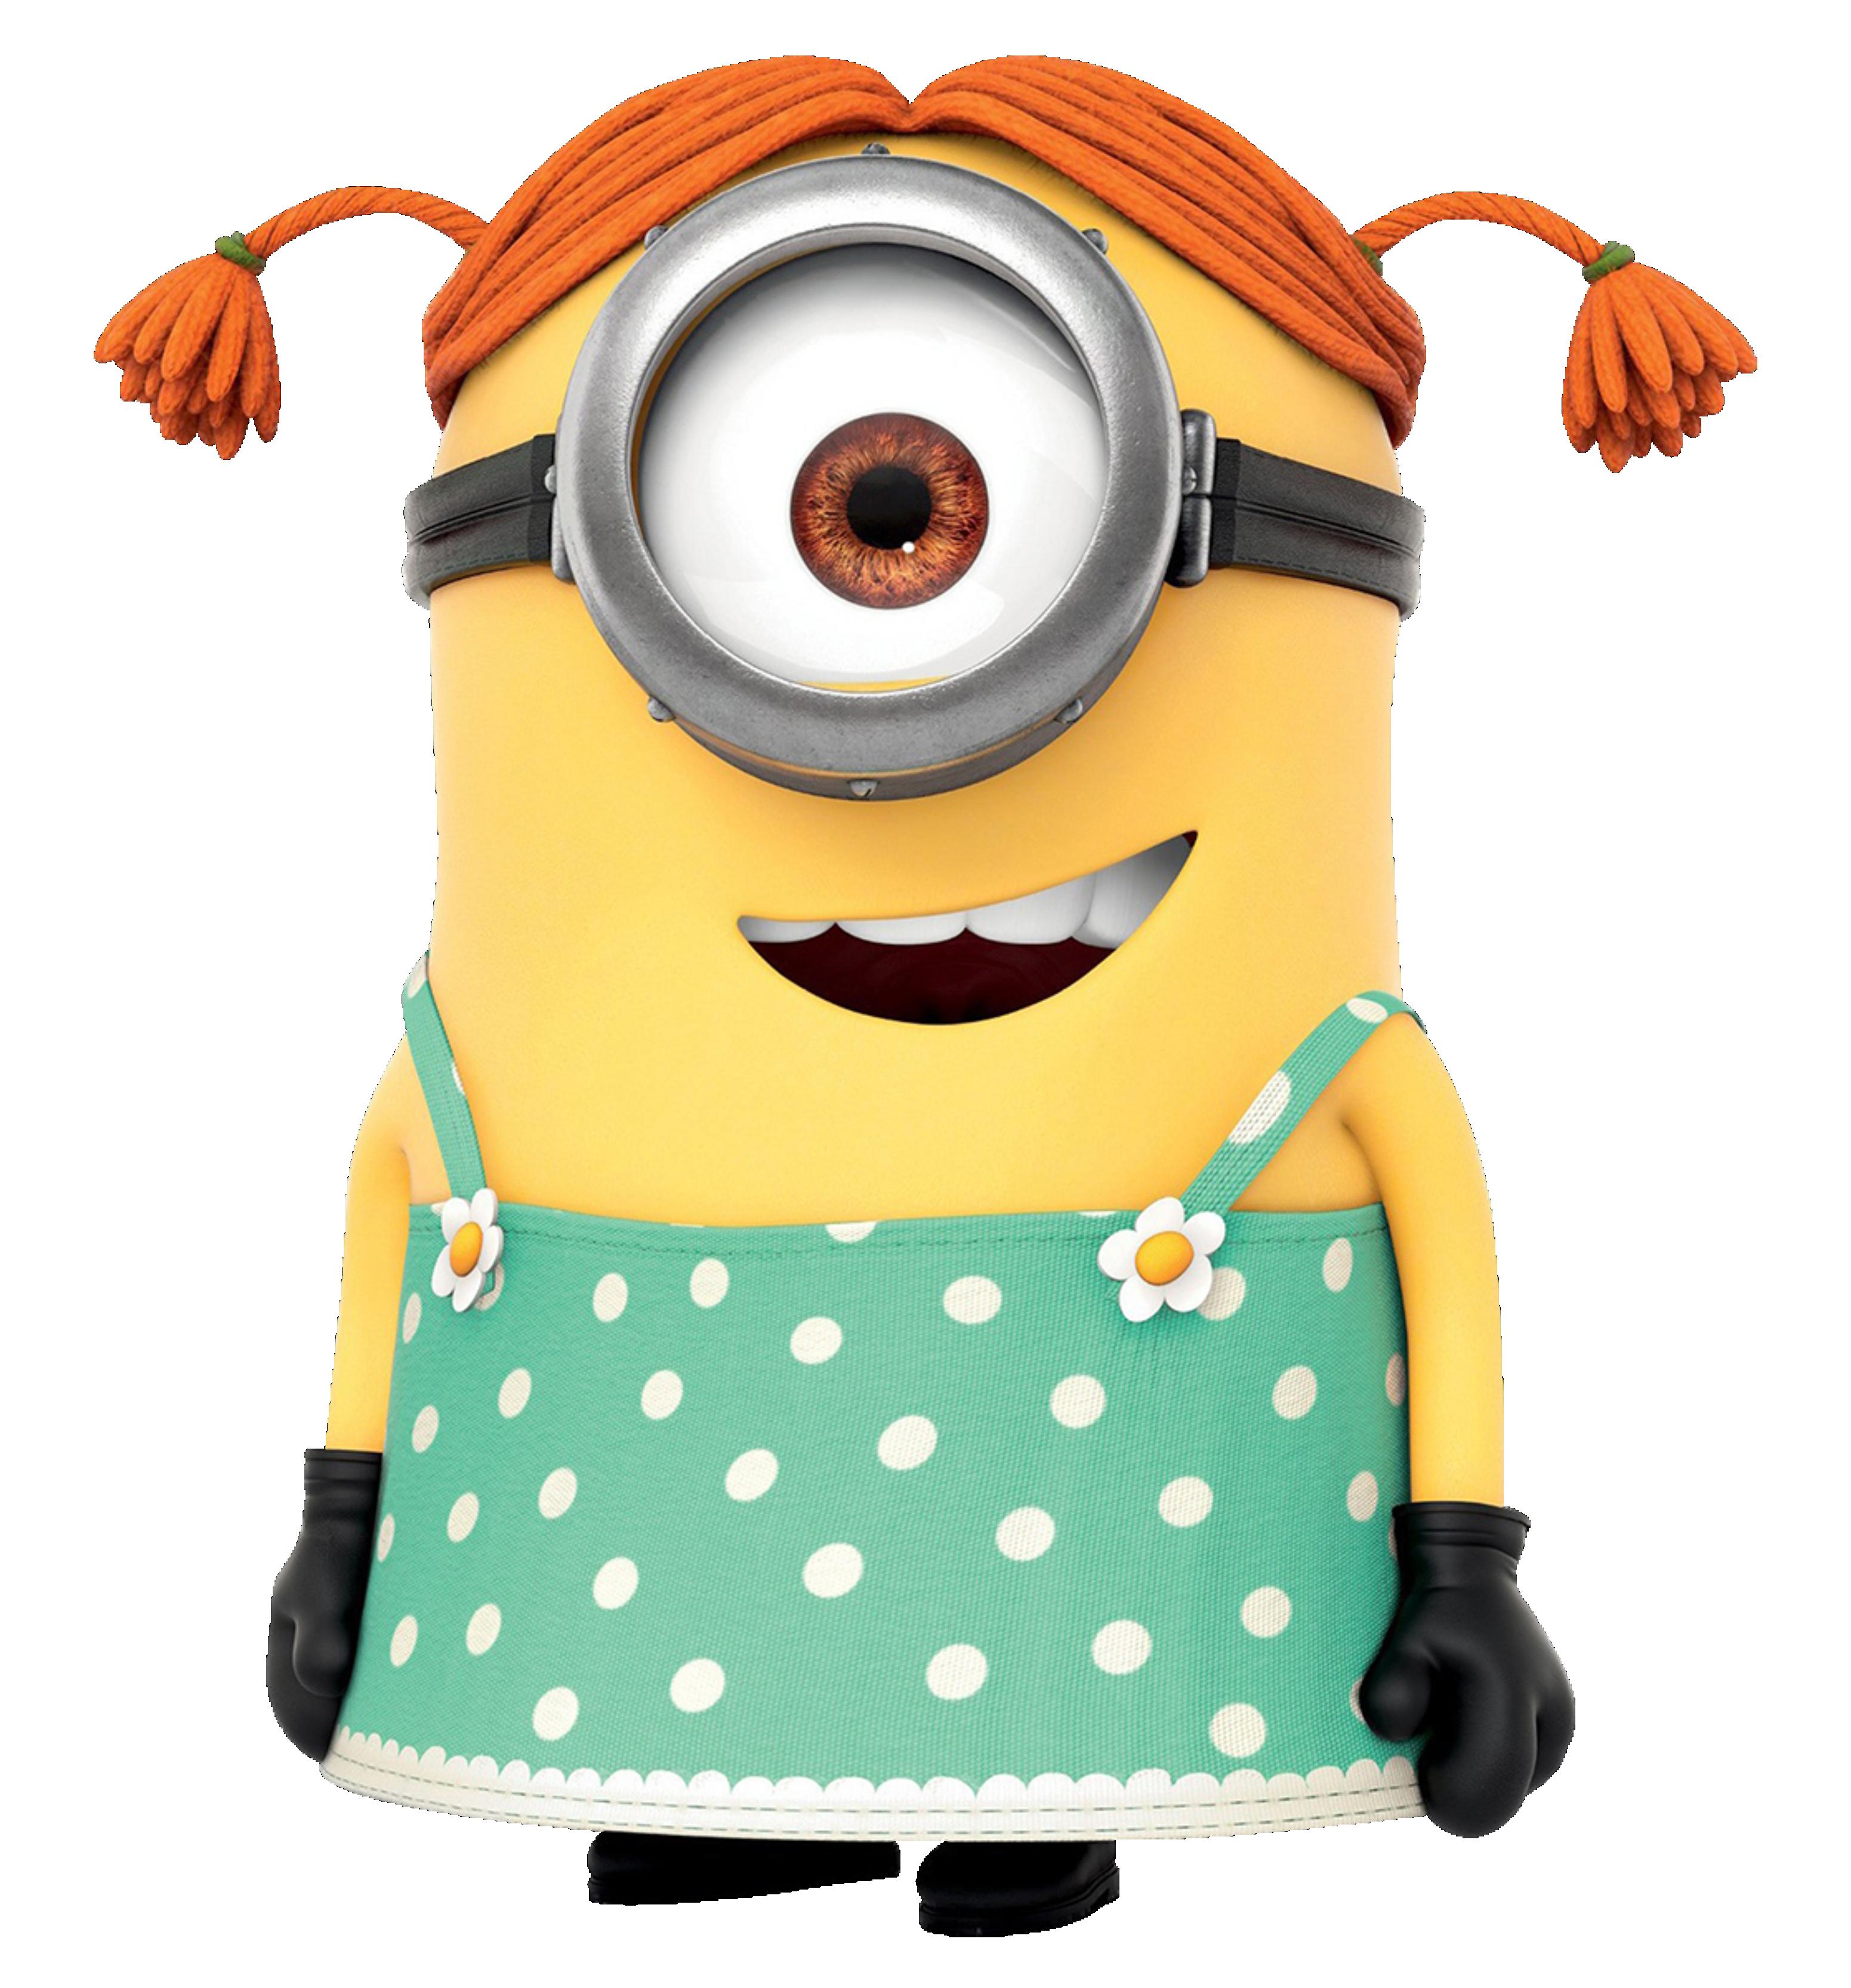 Meu Malvado Favorito - Minions Menina, evil favorite – minions, favorito del mal – minions, böser Favorit - Günstlinge